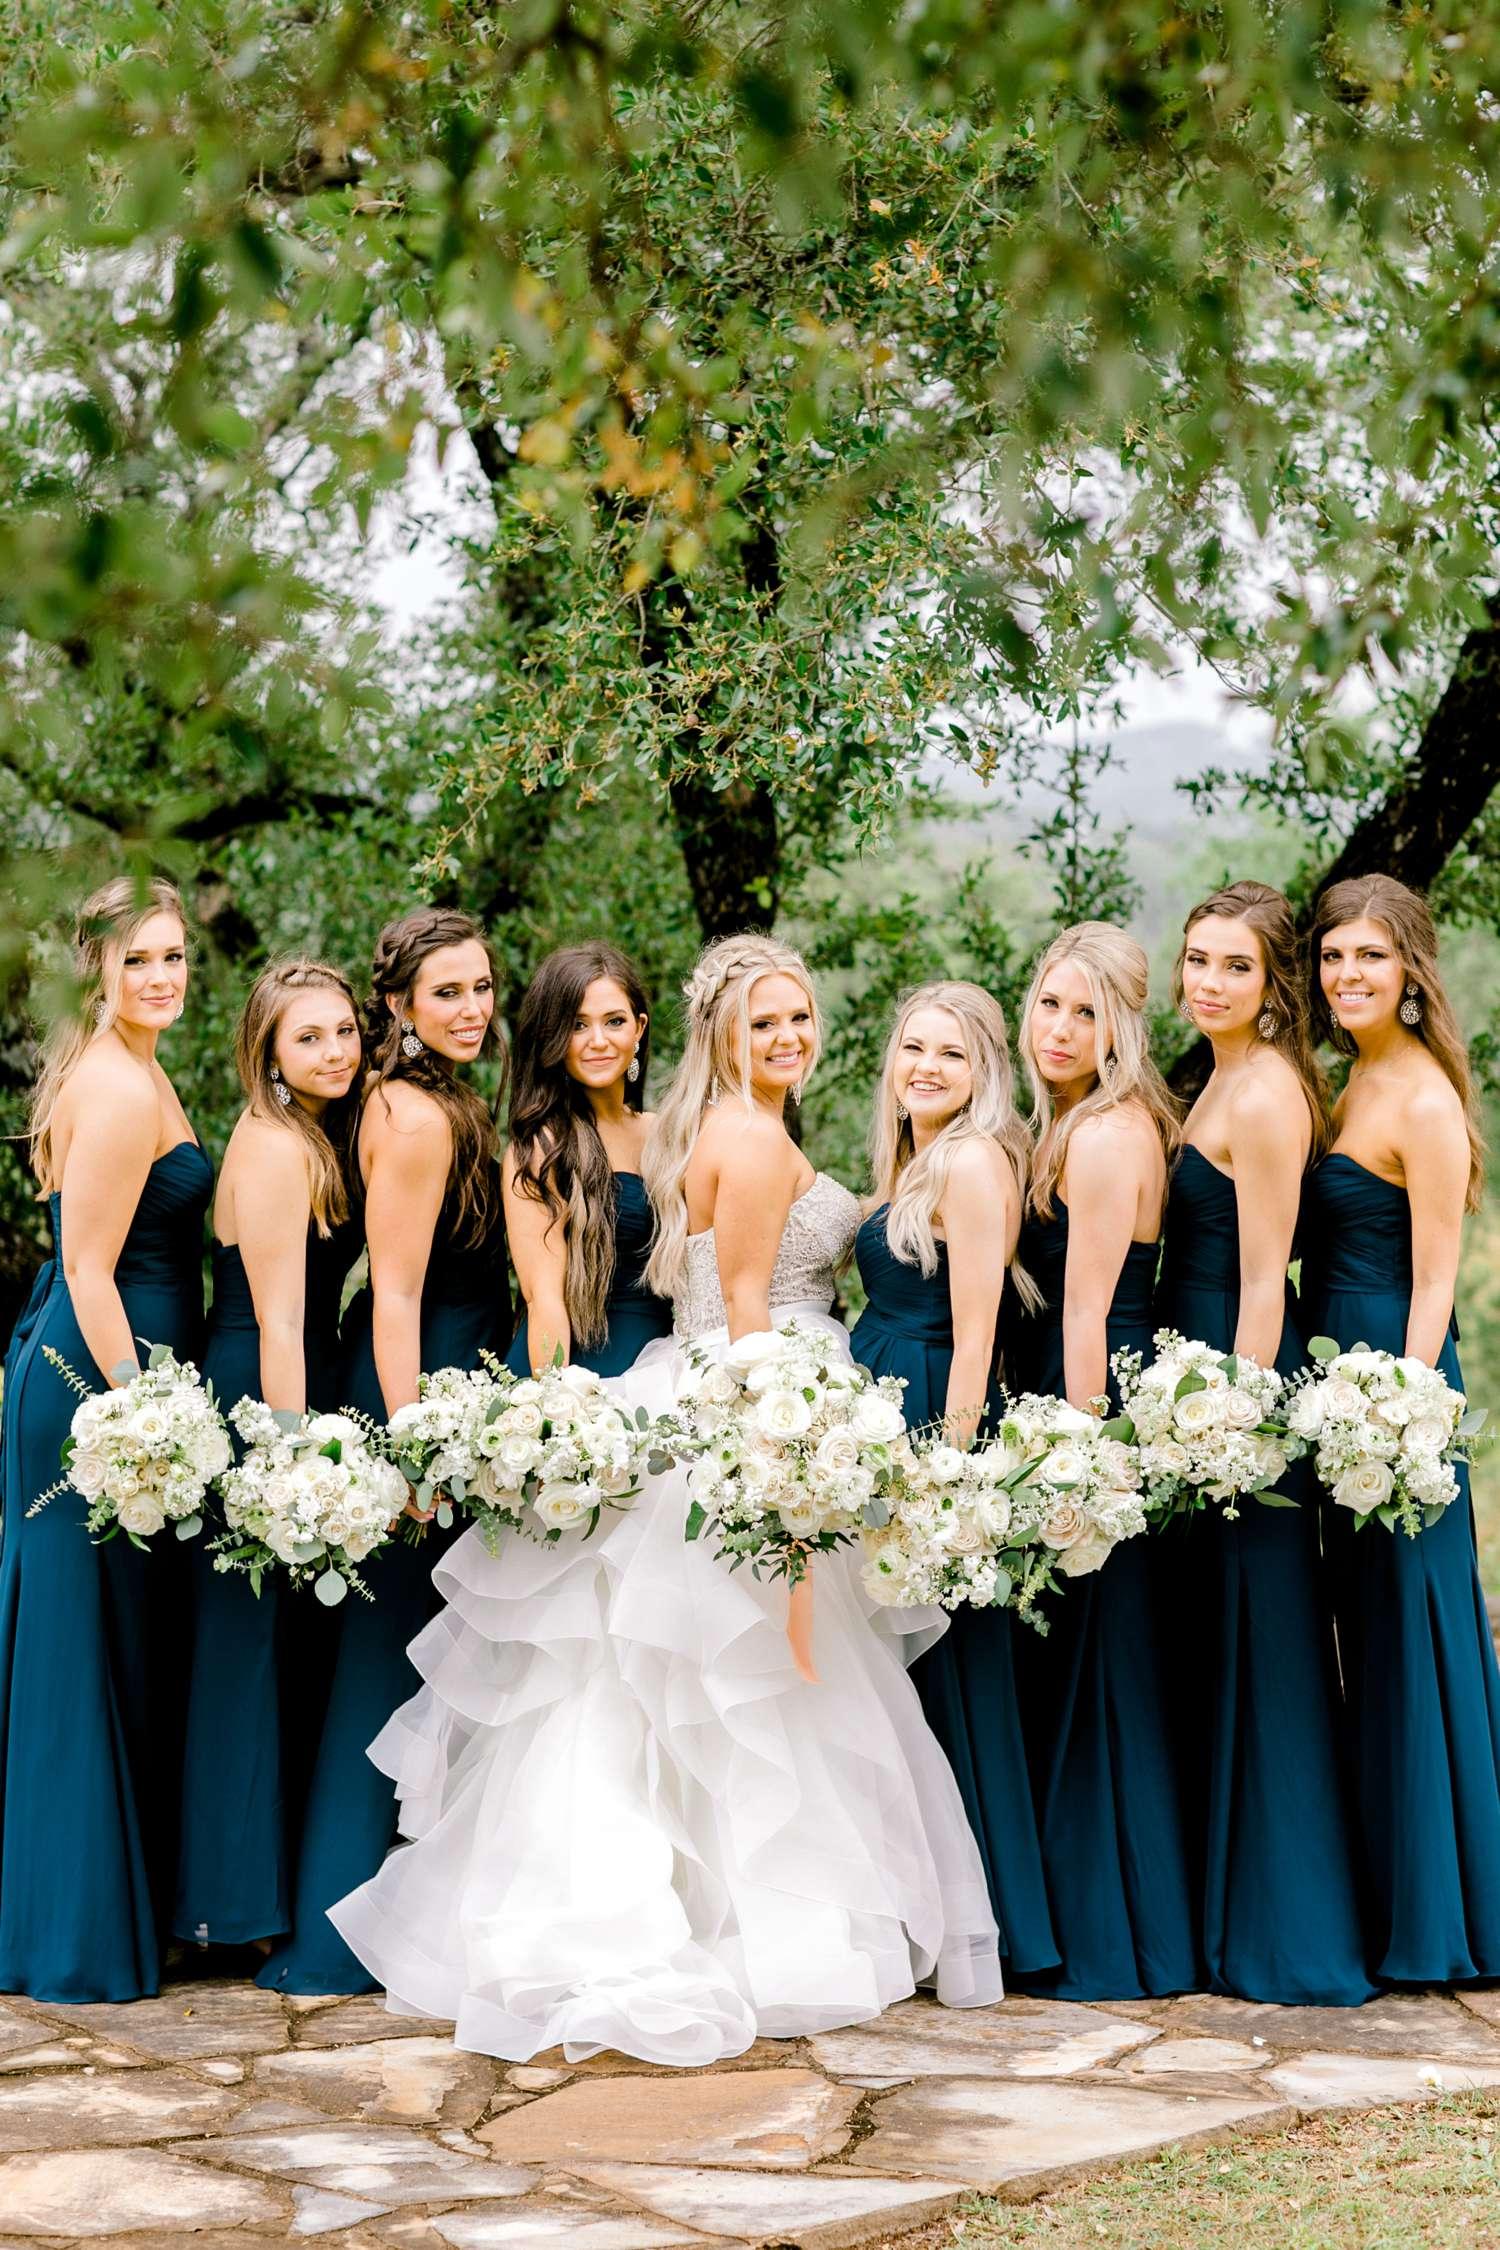 HAYLEE+JUSTIN+GREGORY+HERITAGE_HAUS_AUSTIN_TEXAS_WEDDING_0027.jpg